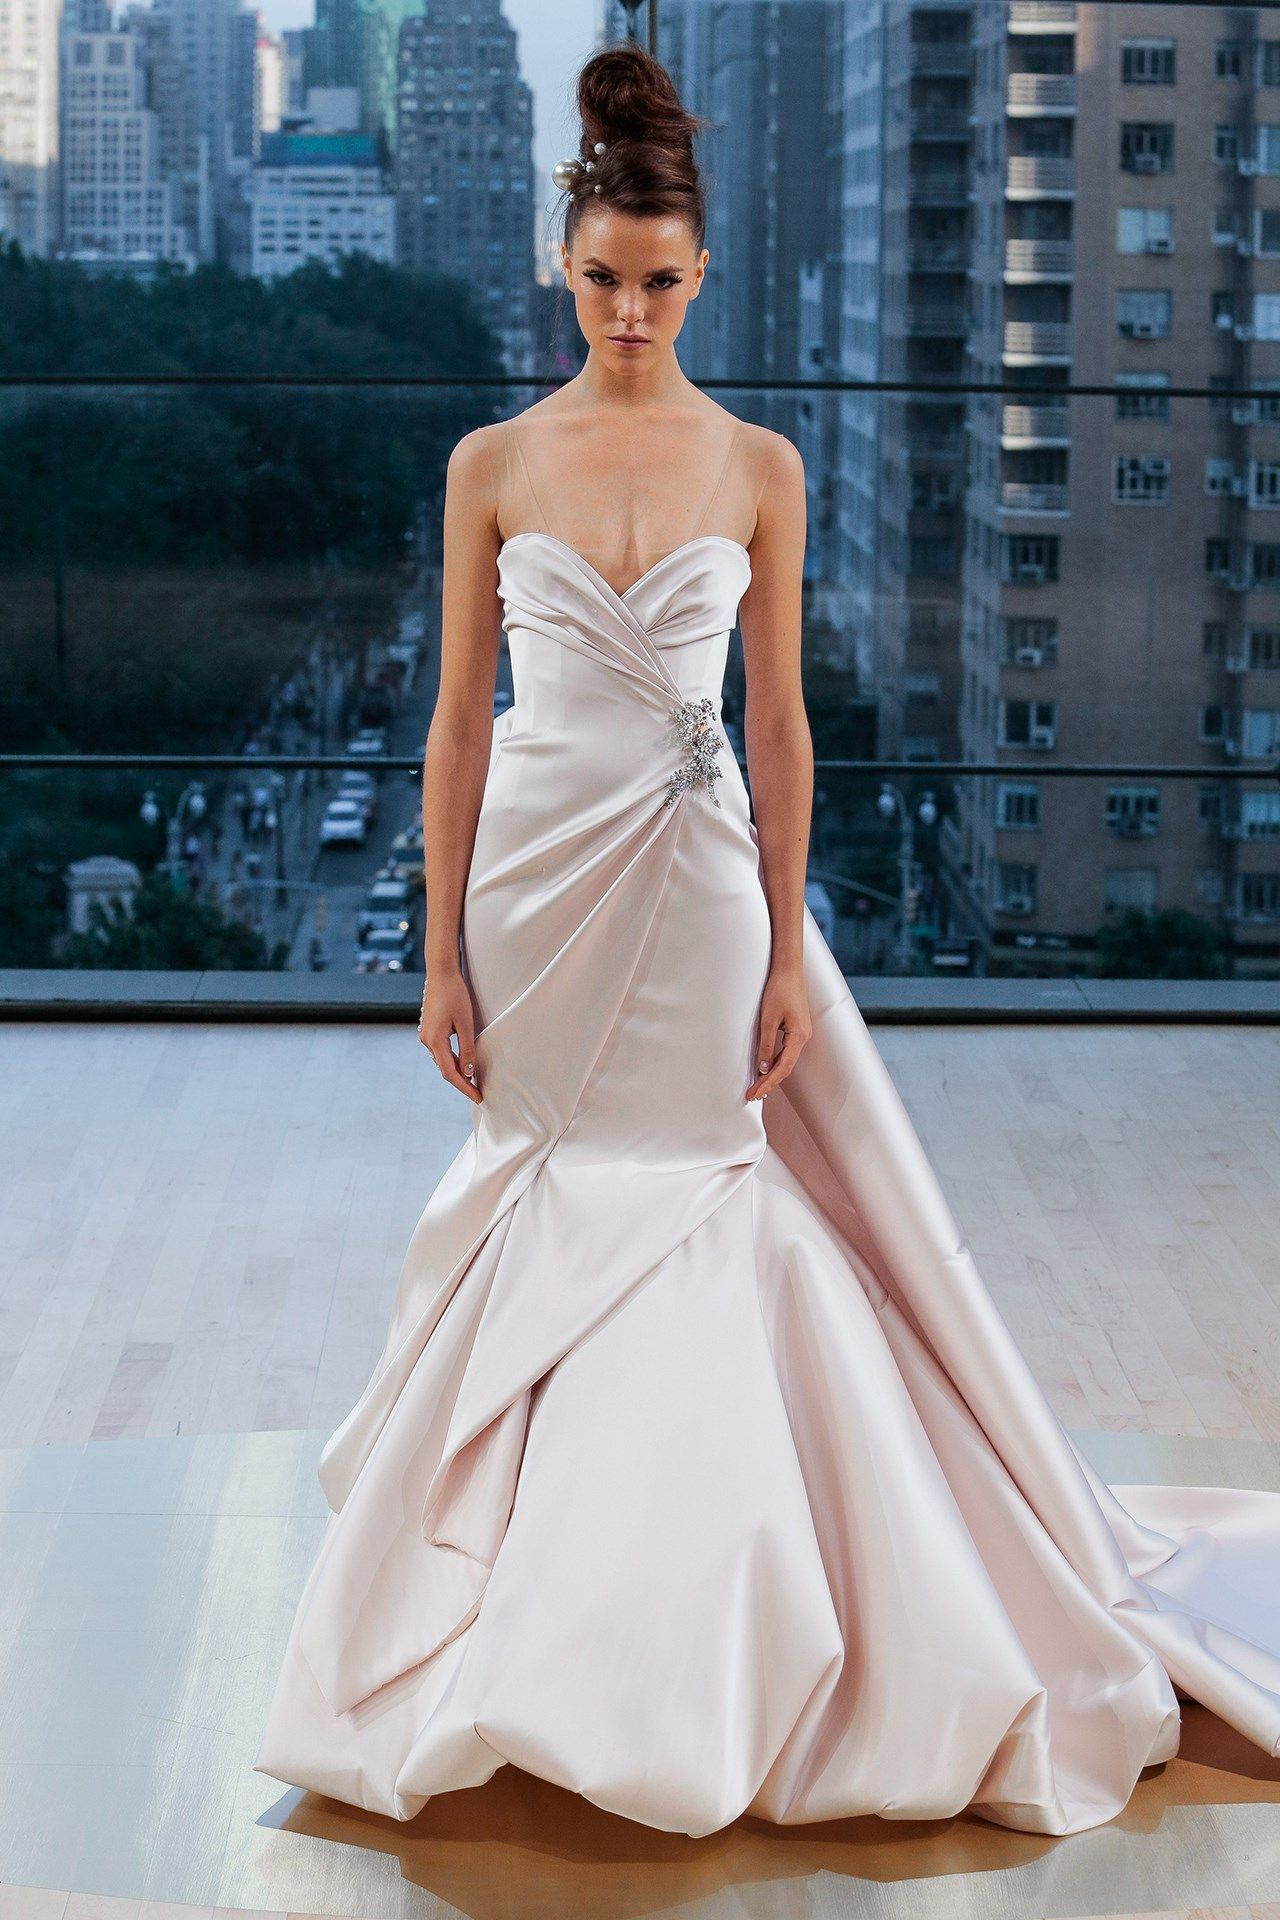 7ec7e14fe4e5 Blush Pink Wedding Dress Designer - Aztec Stone and Reclamations